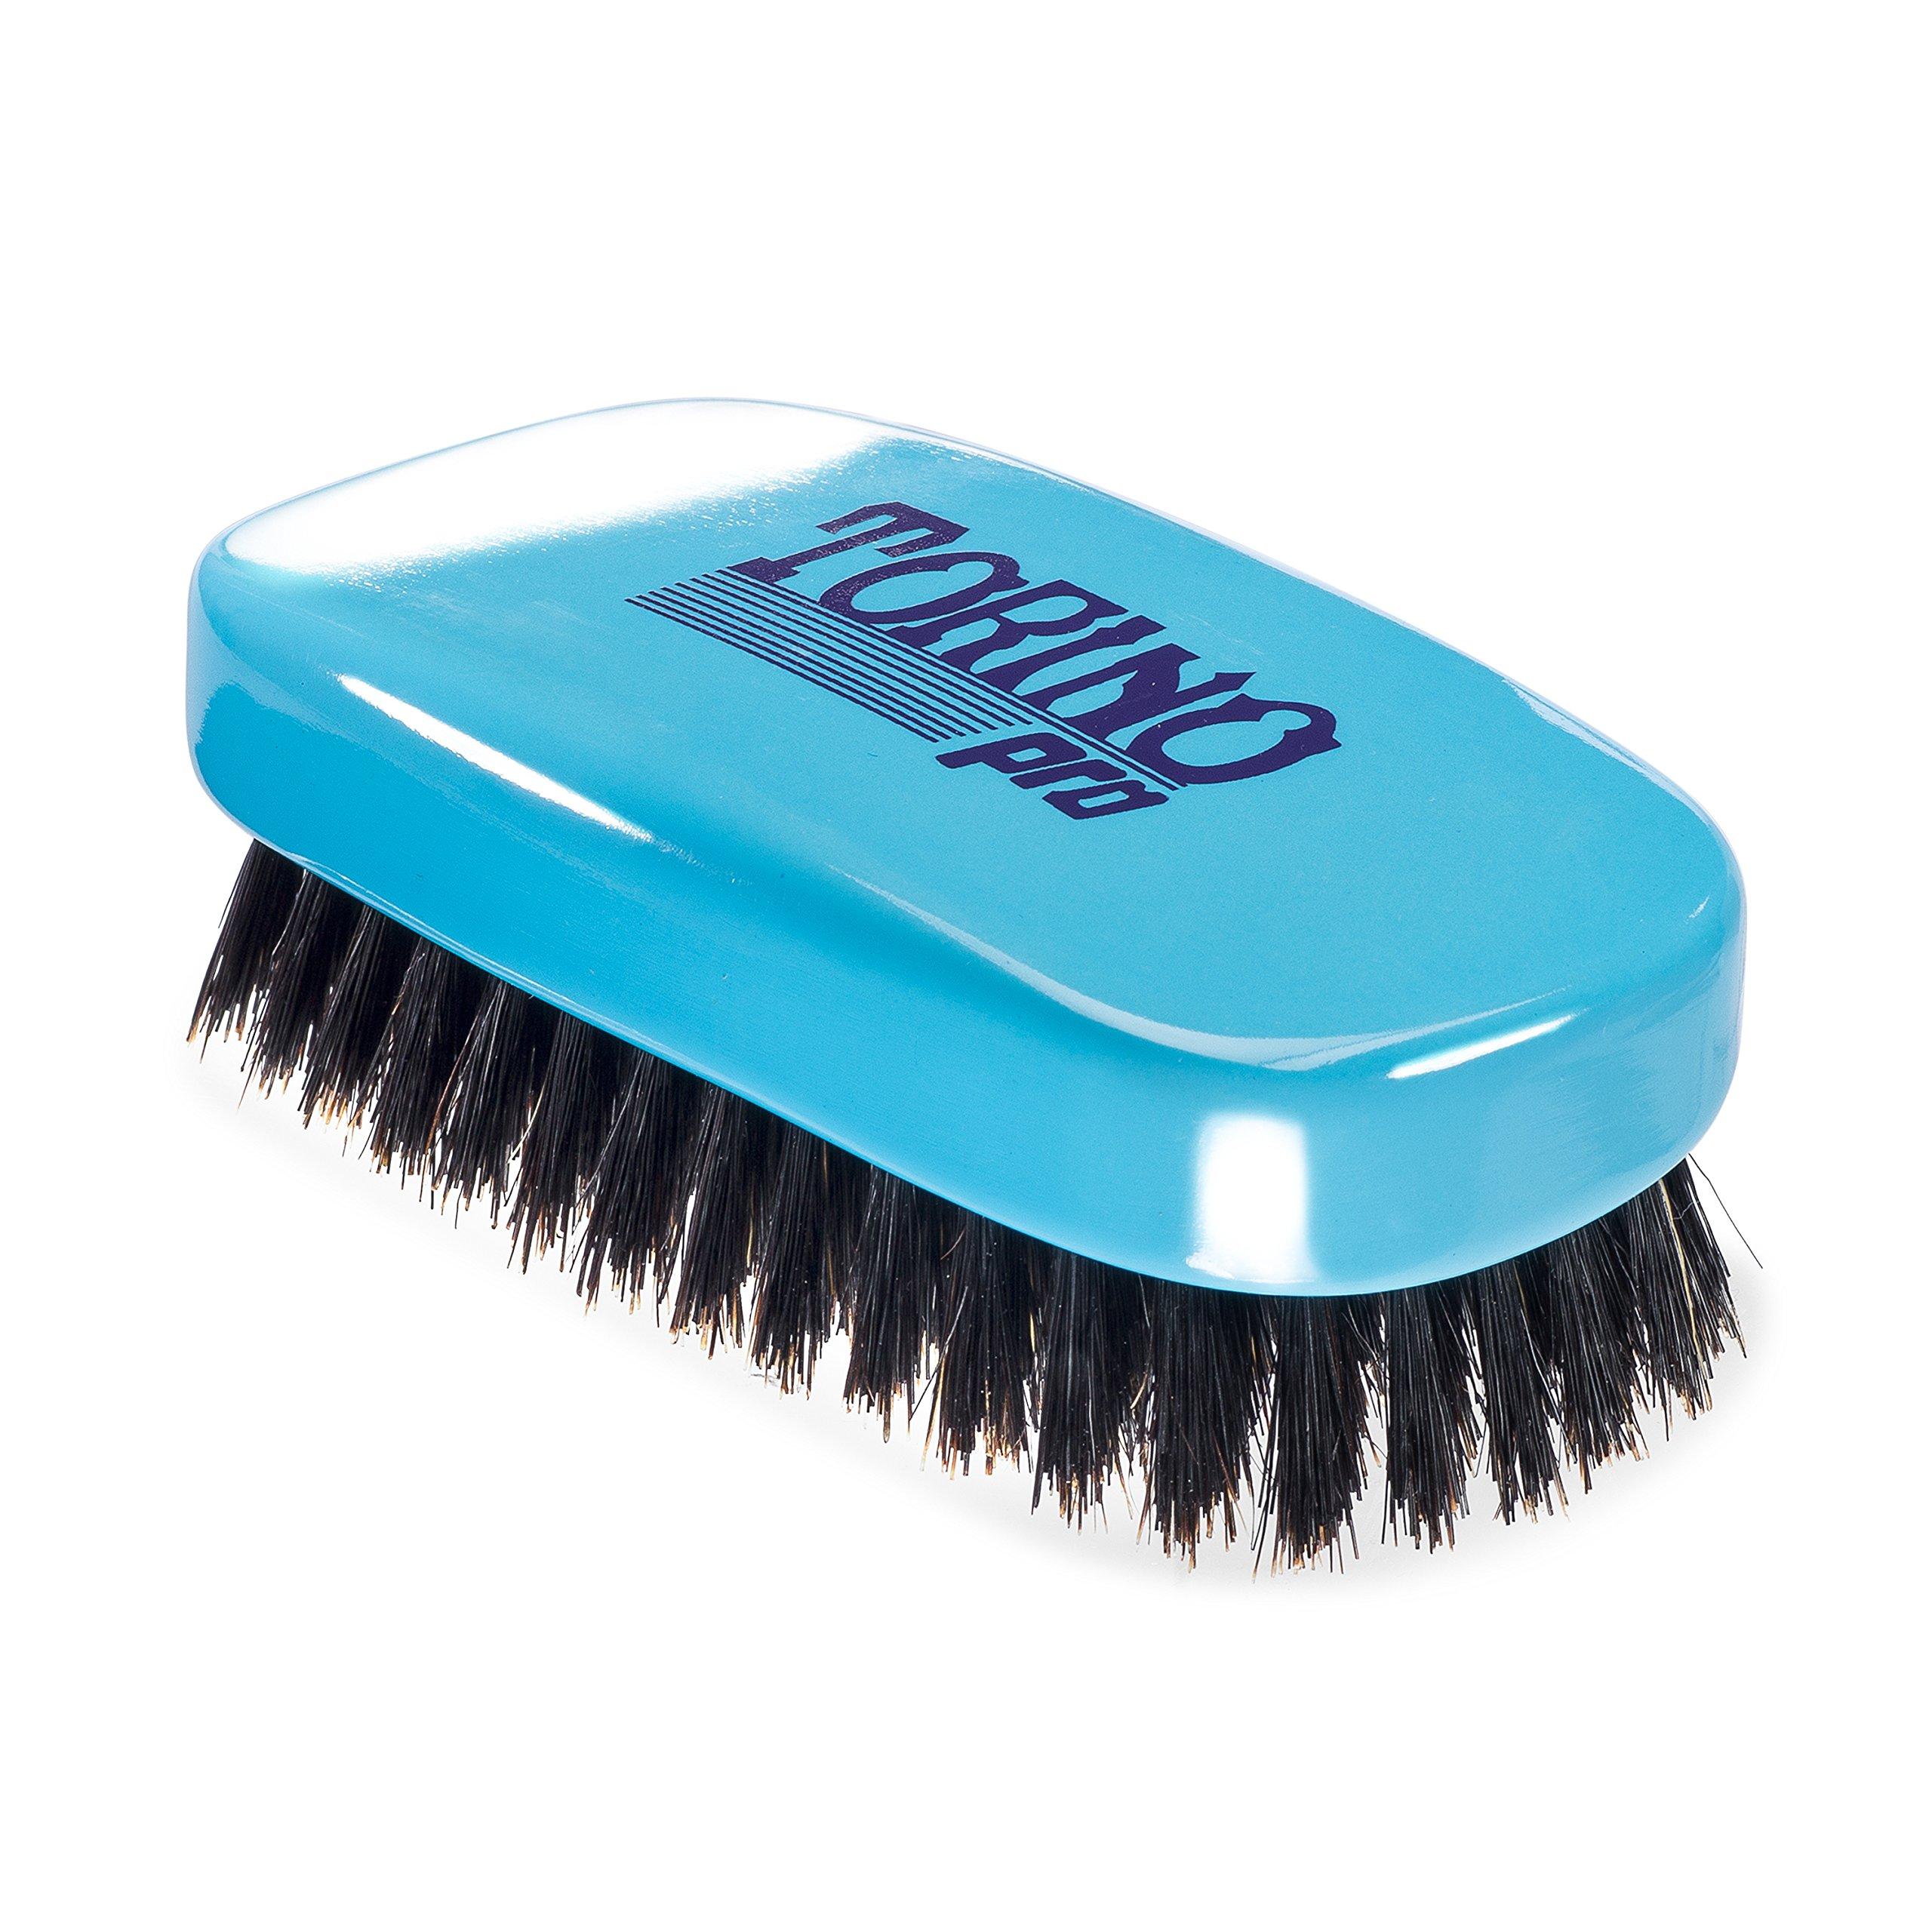 Torino Pro Wave Brush #820 By Brush King - 11 Row Medium 360 Waves Palm Brush